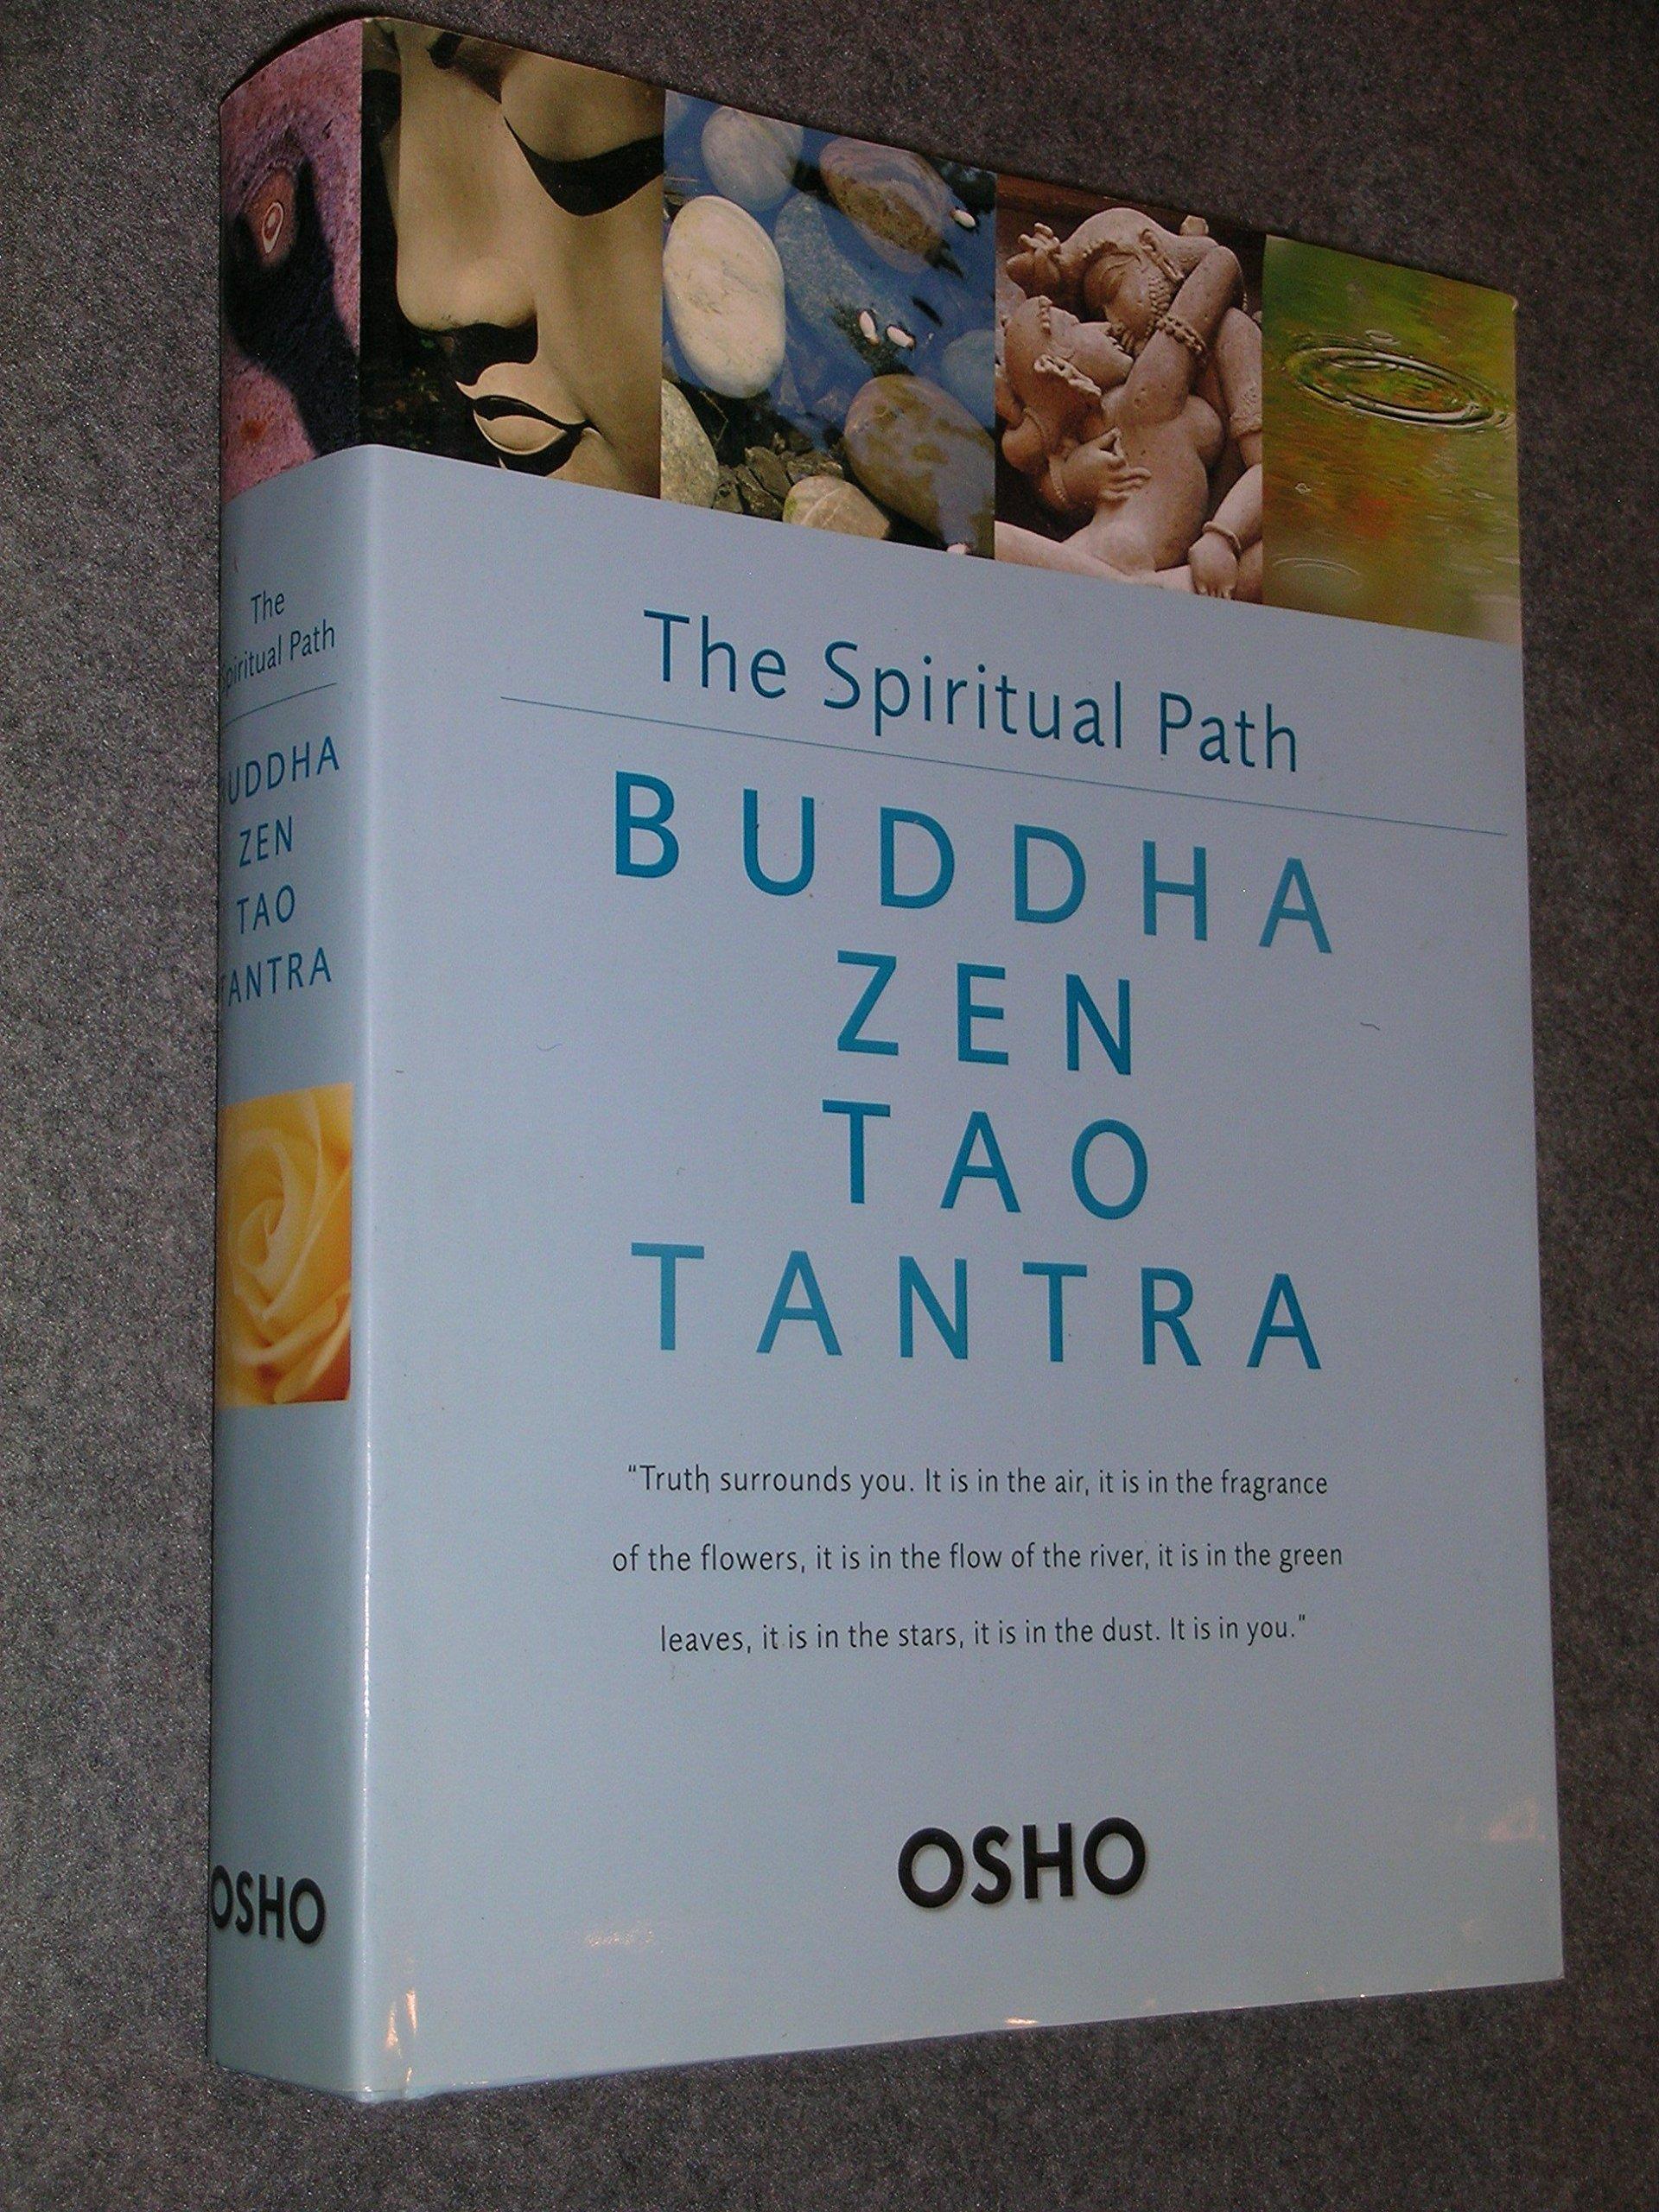 The Spiritual Path: Buddha Zen Tao Tantra ebook